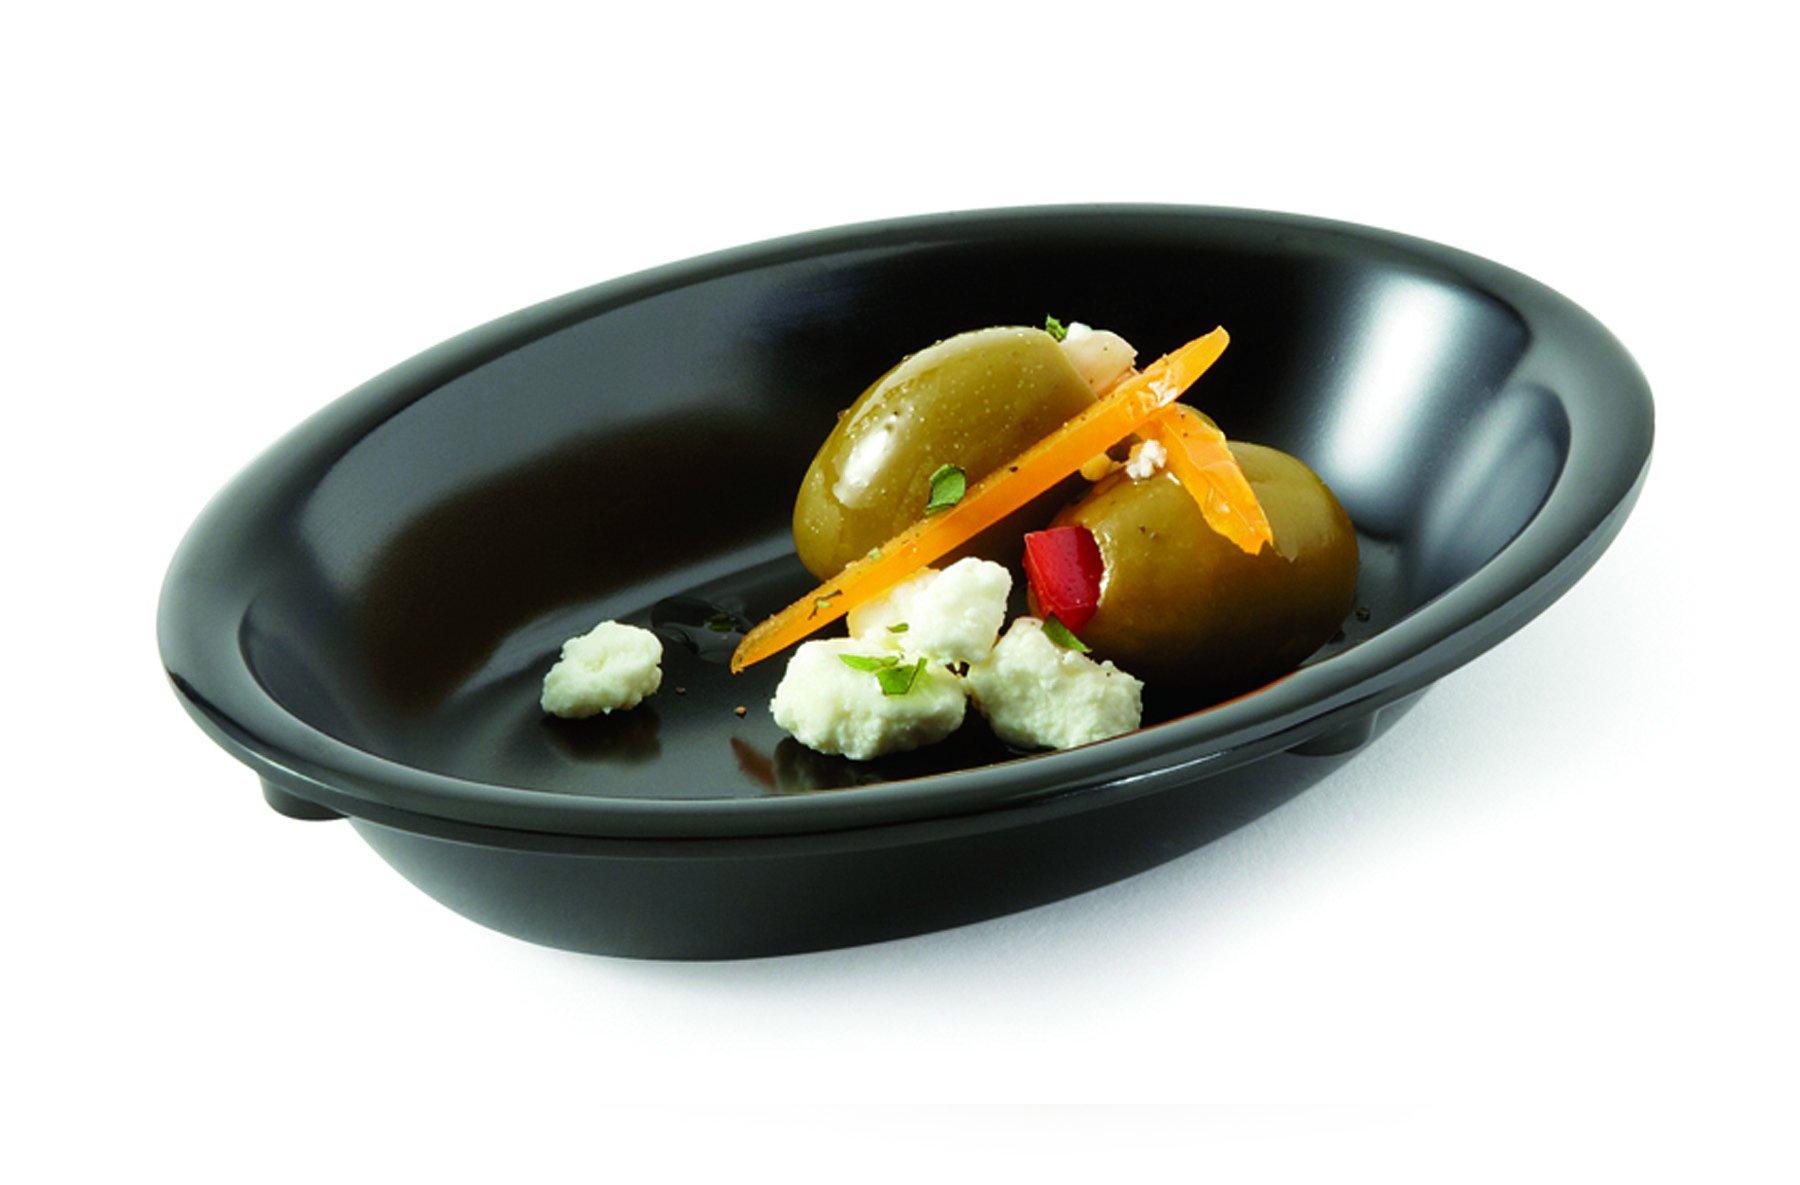 G.E.T. Enterprises 5 oz. Black Side Dish, Break Resistant, Ramekins by GET DN-365-BK-EC (Pack of 4)